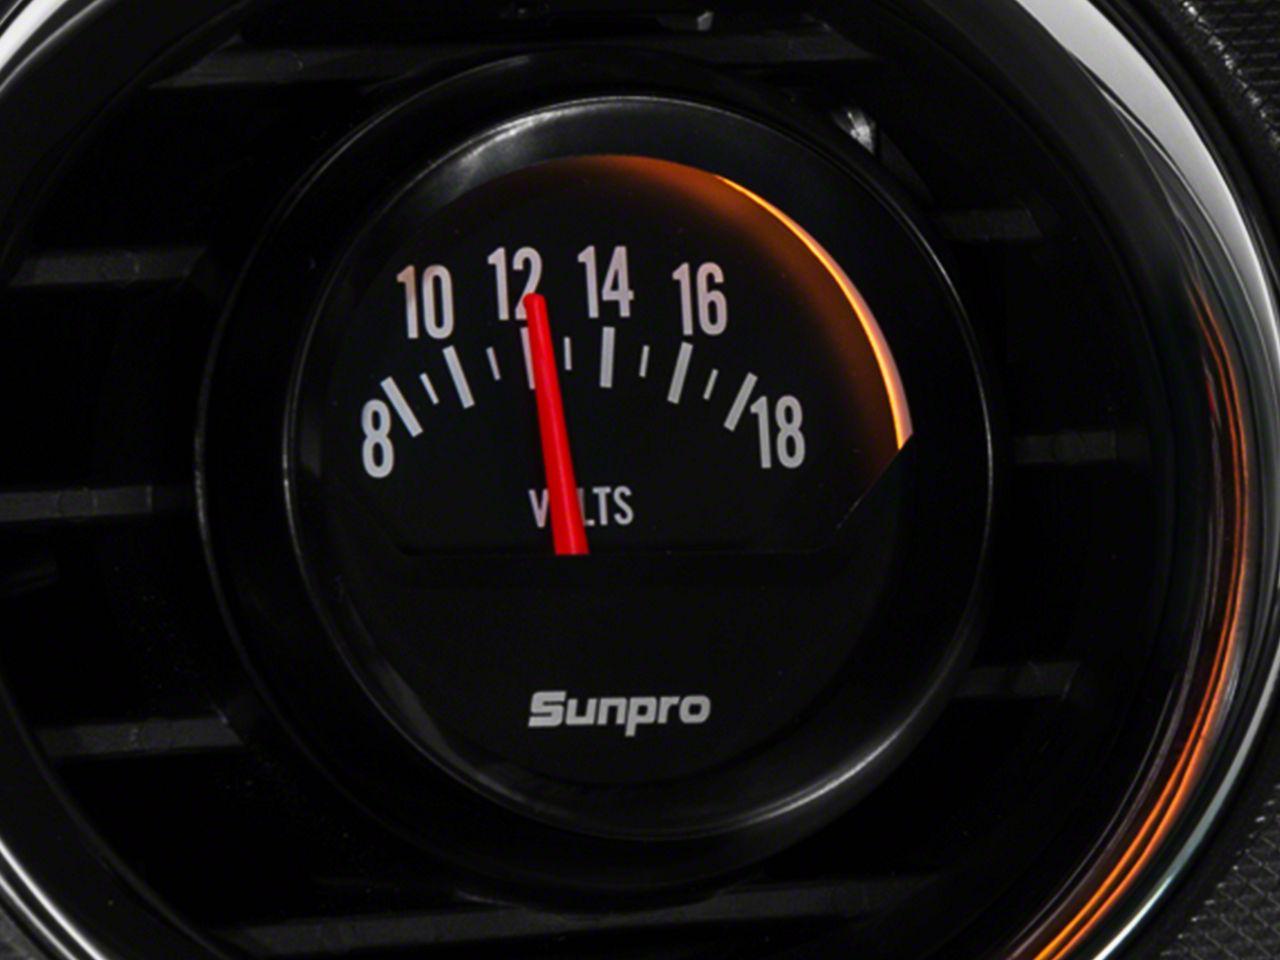 Bosch Black Styleline Voltmeter Gauge - Electrical (79-19 All)